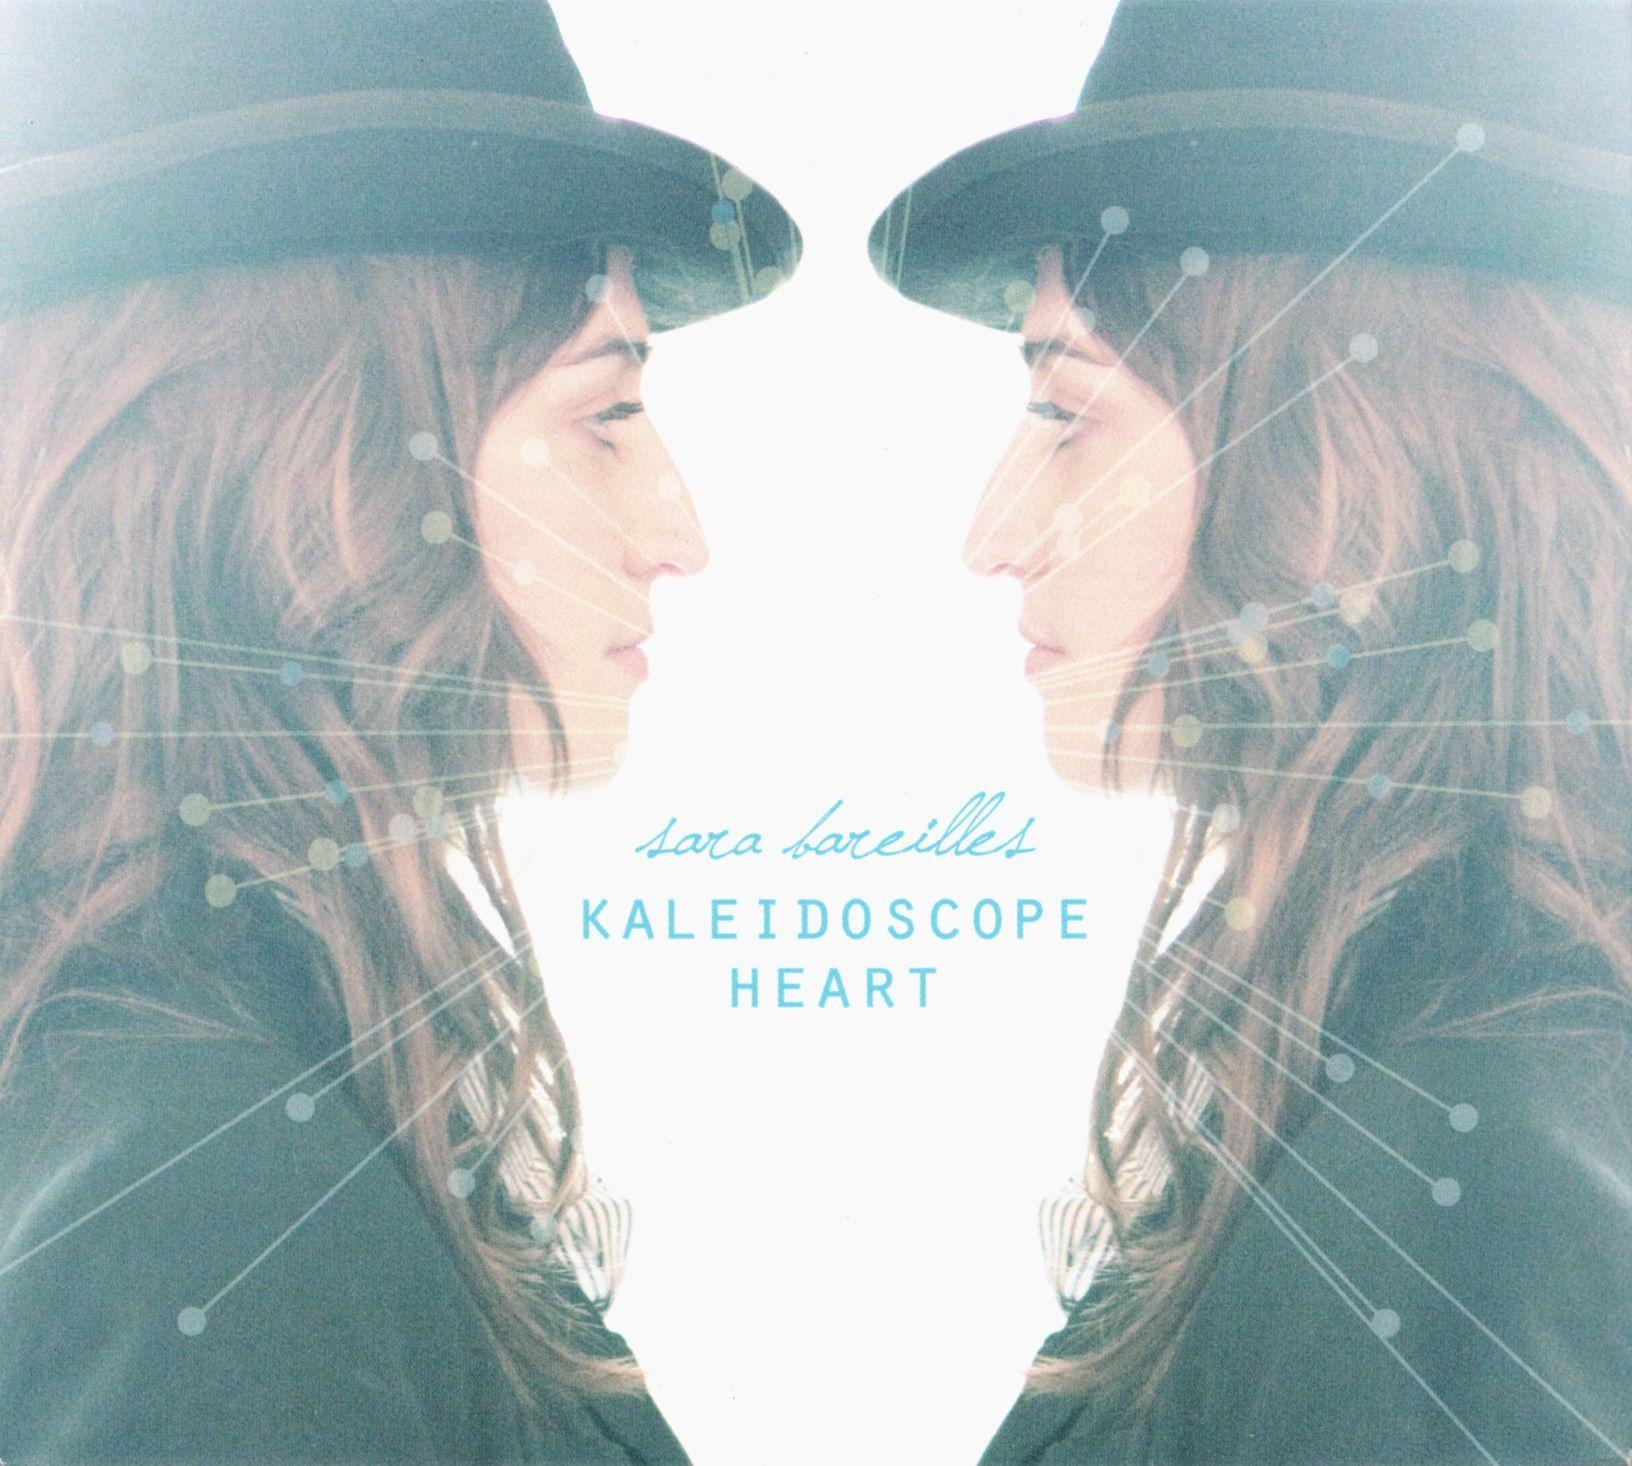 Sara Bareilles - Kaleidoscope Heart album cover